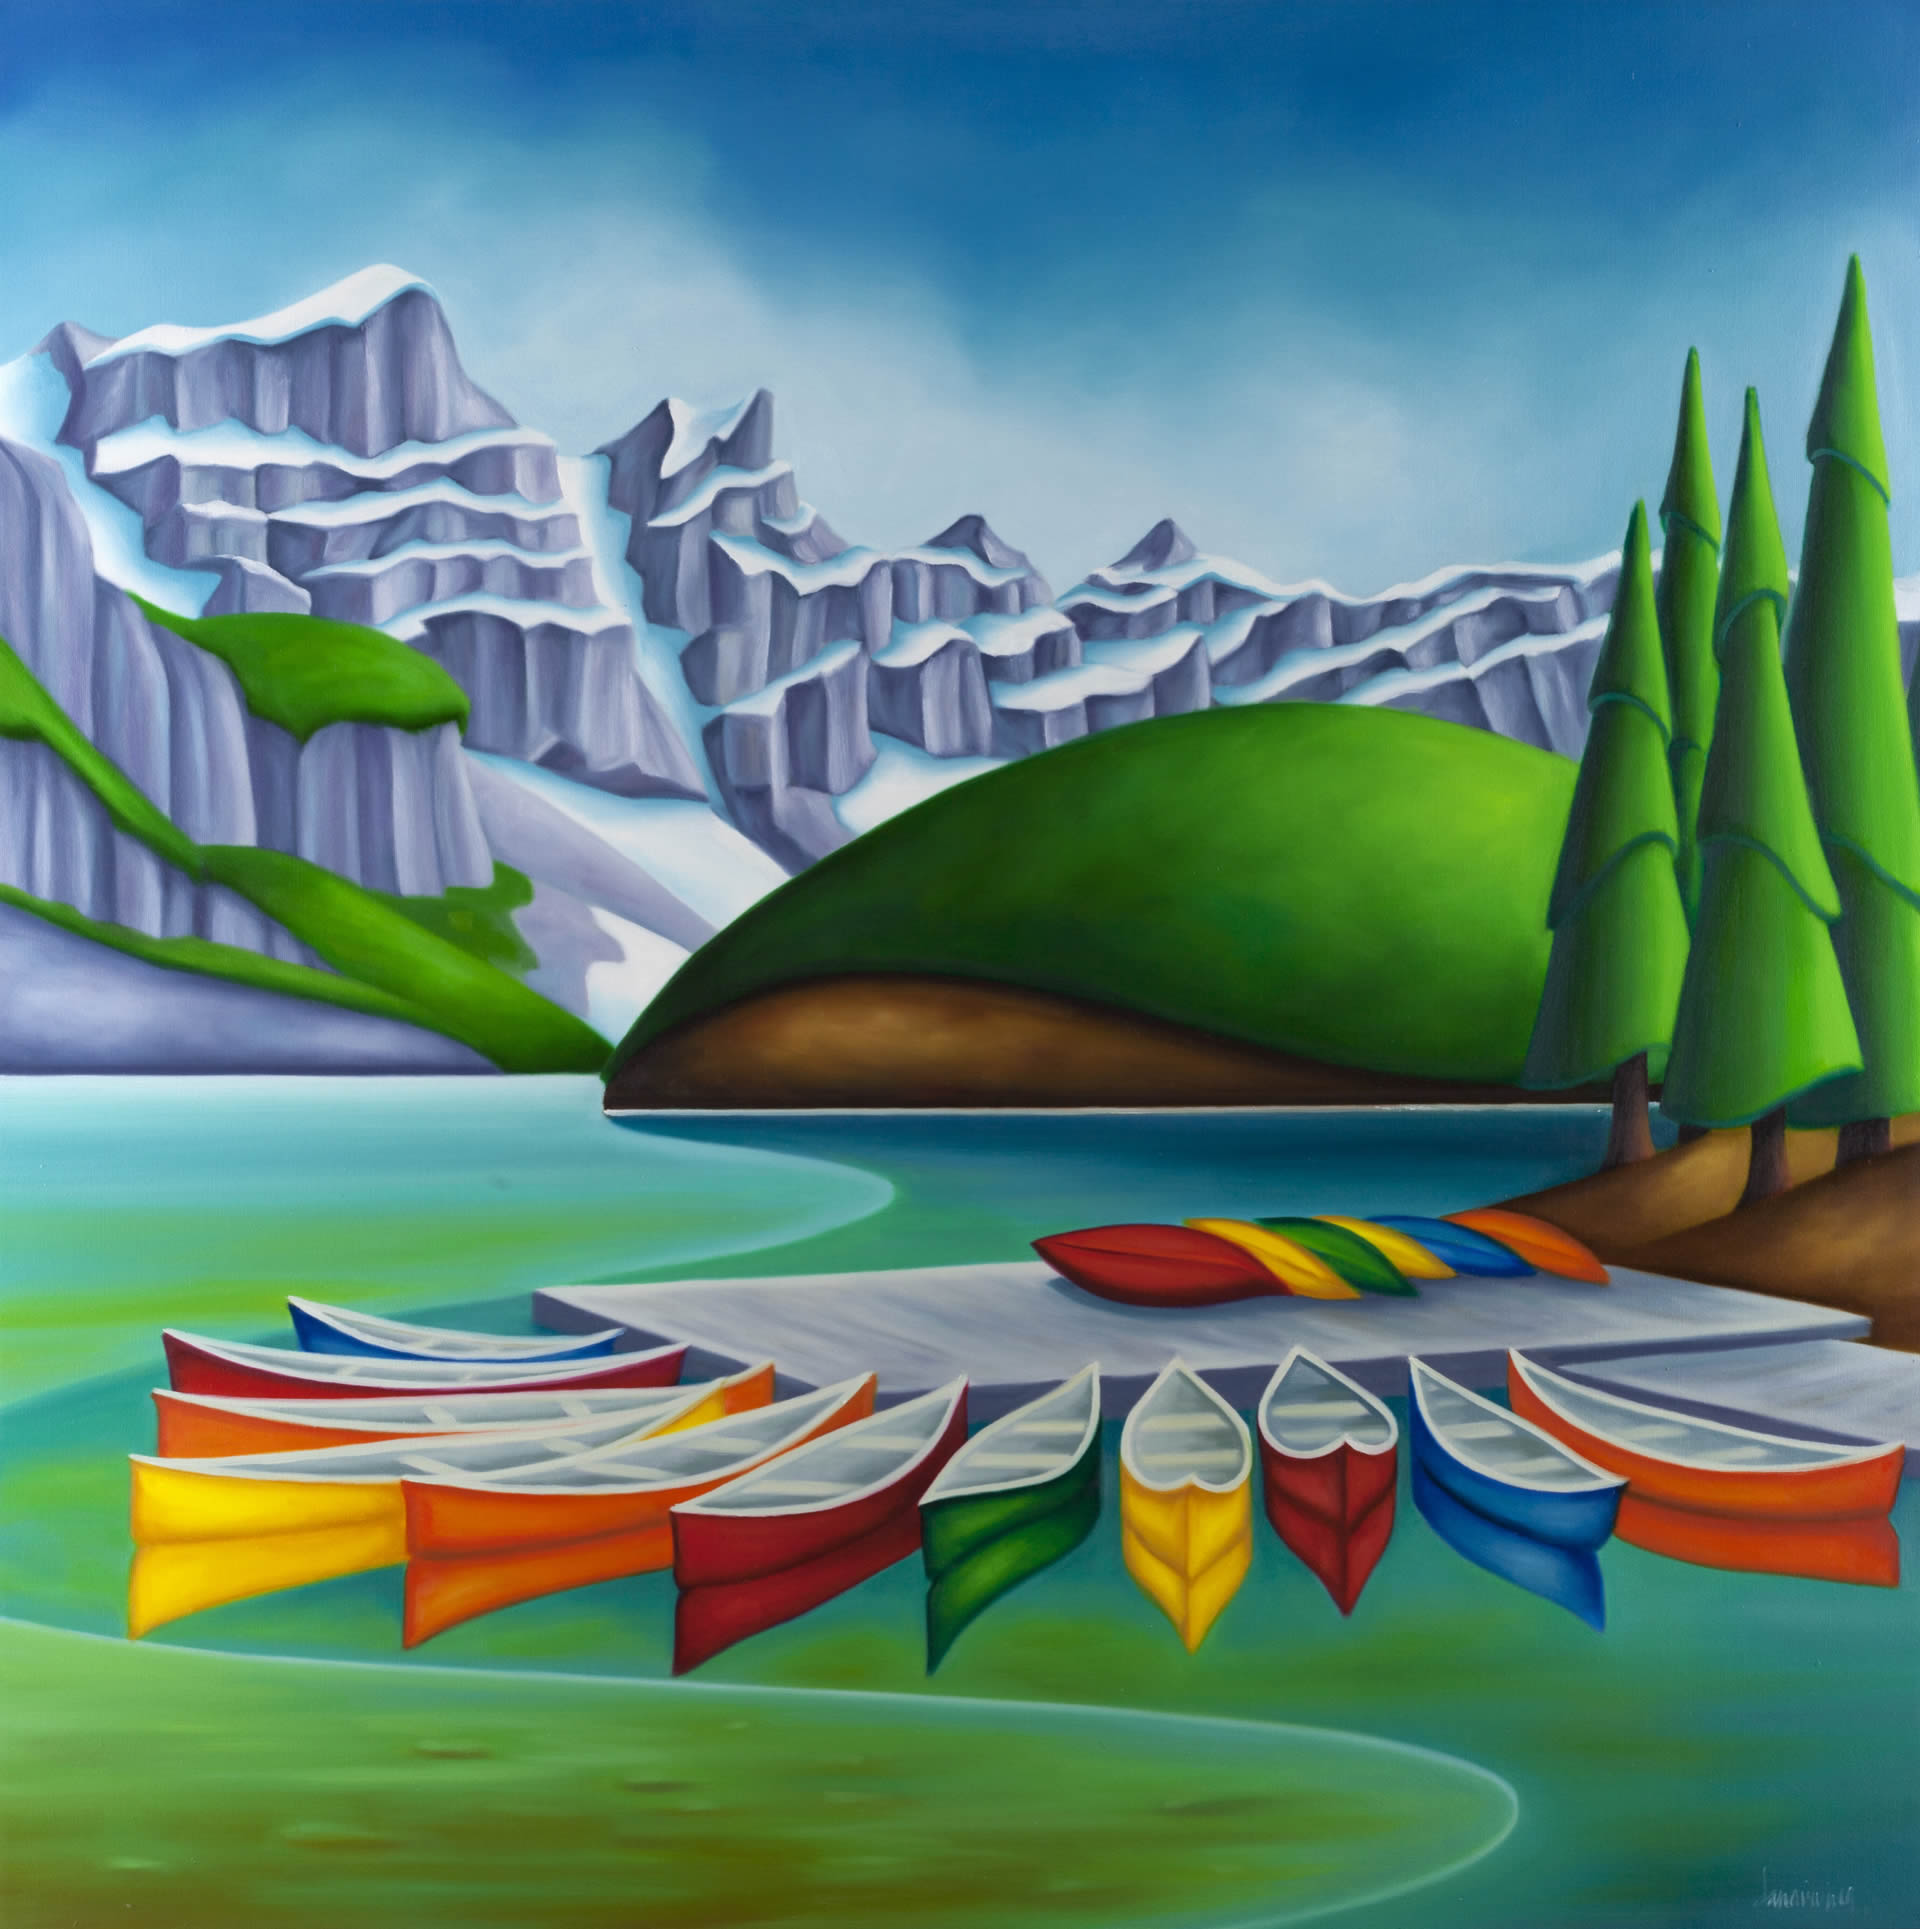 Dana-Irving-Happy-2020-Oil-On-Canvas-36x36-4500-Online-Art-Galleries